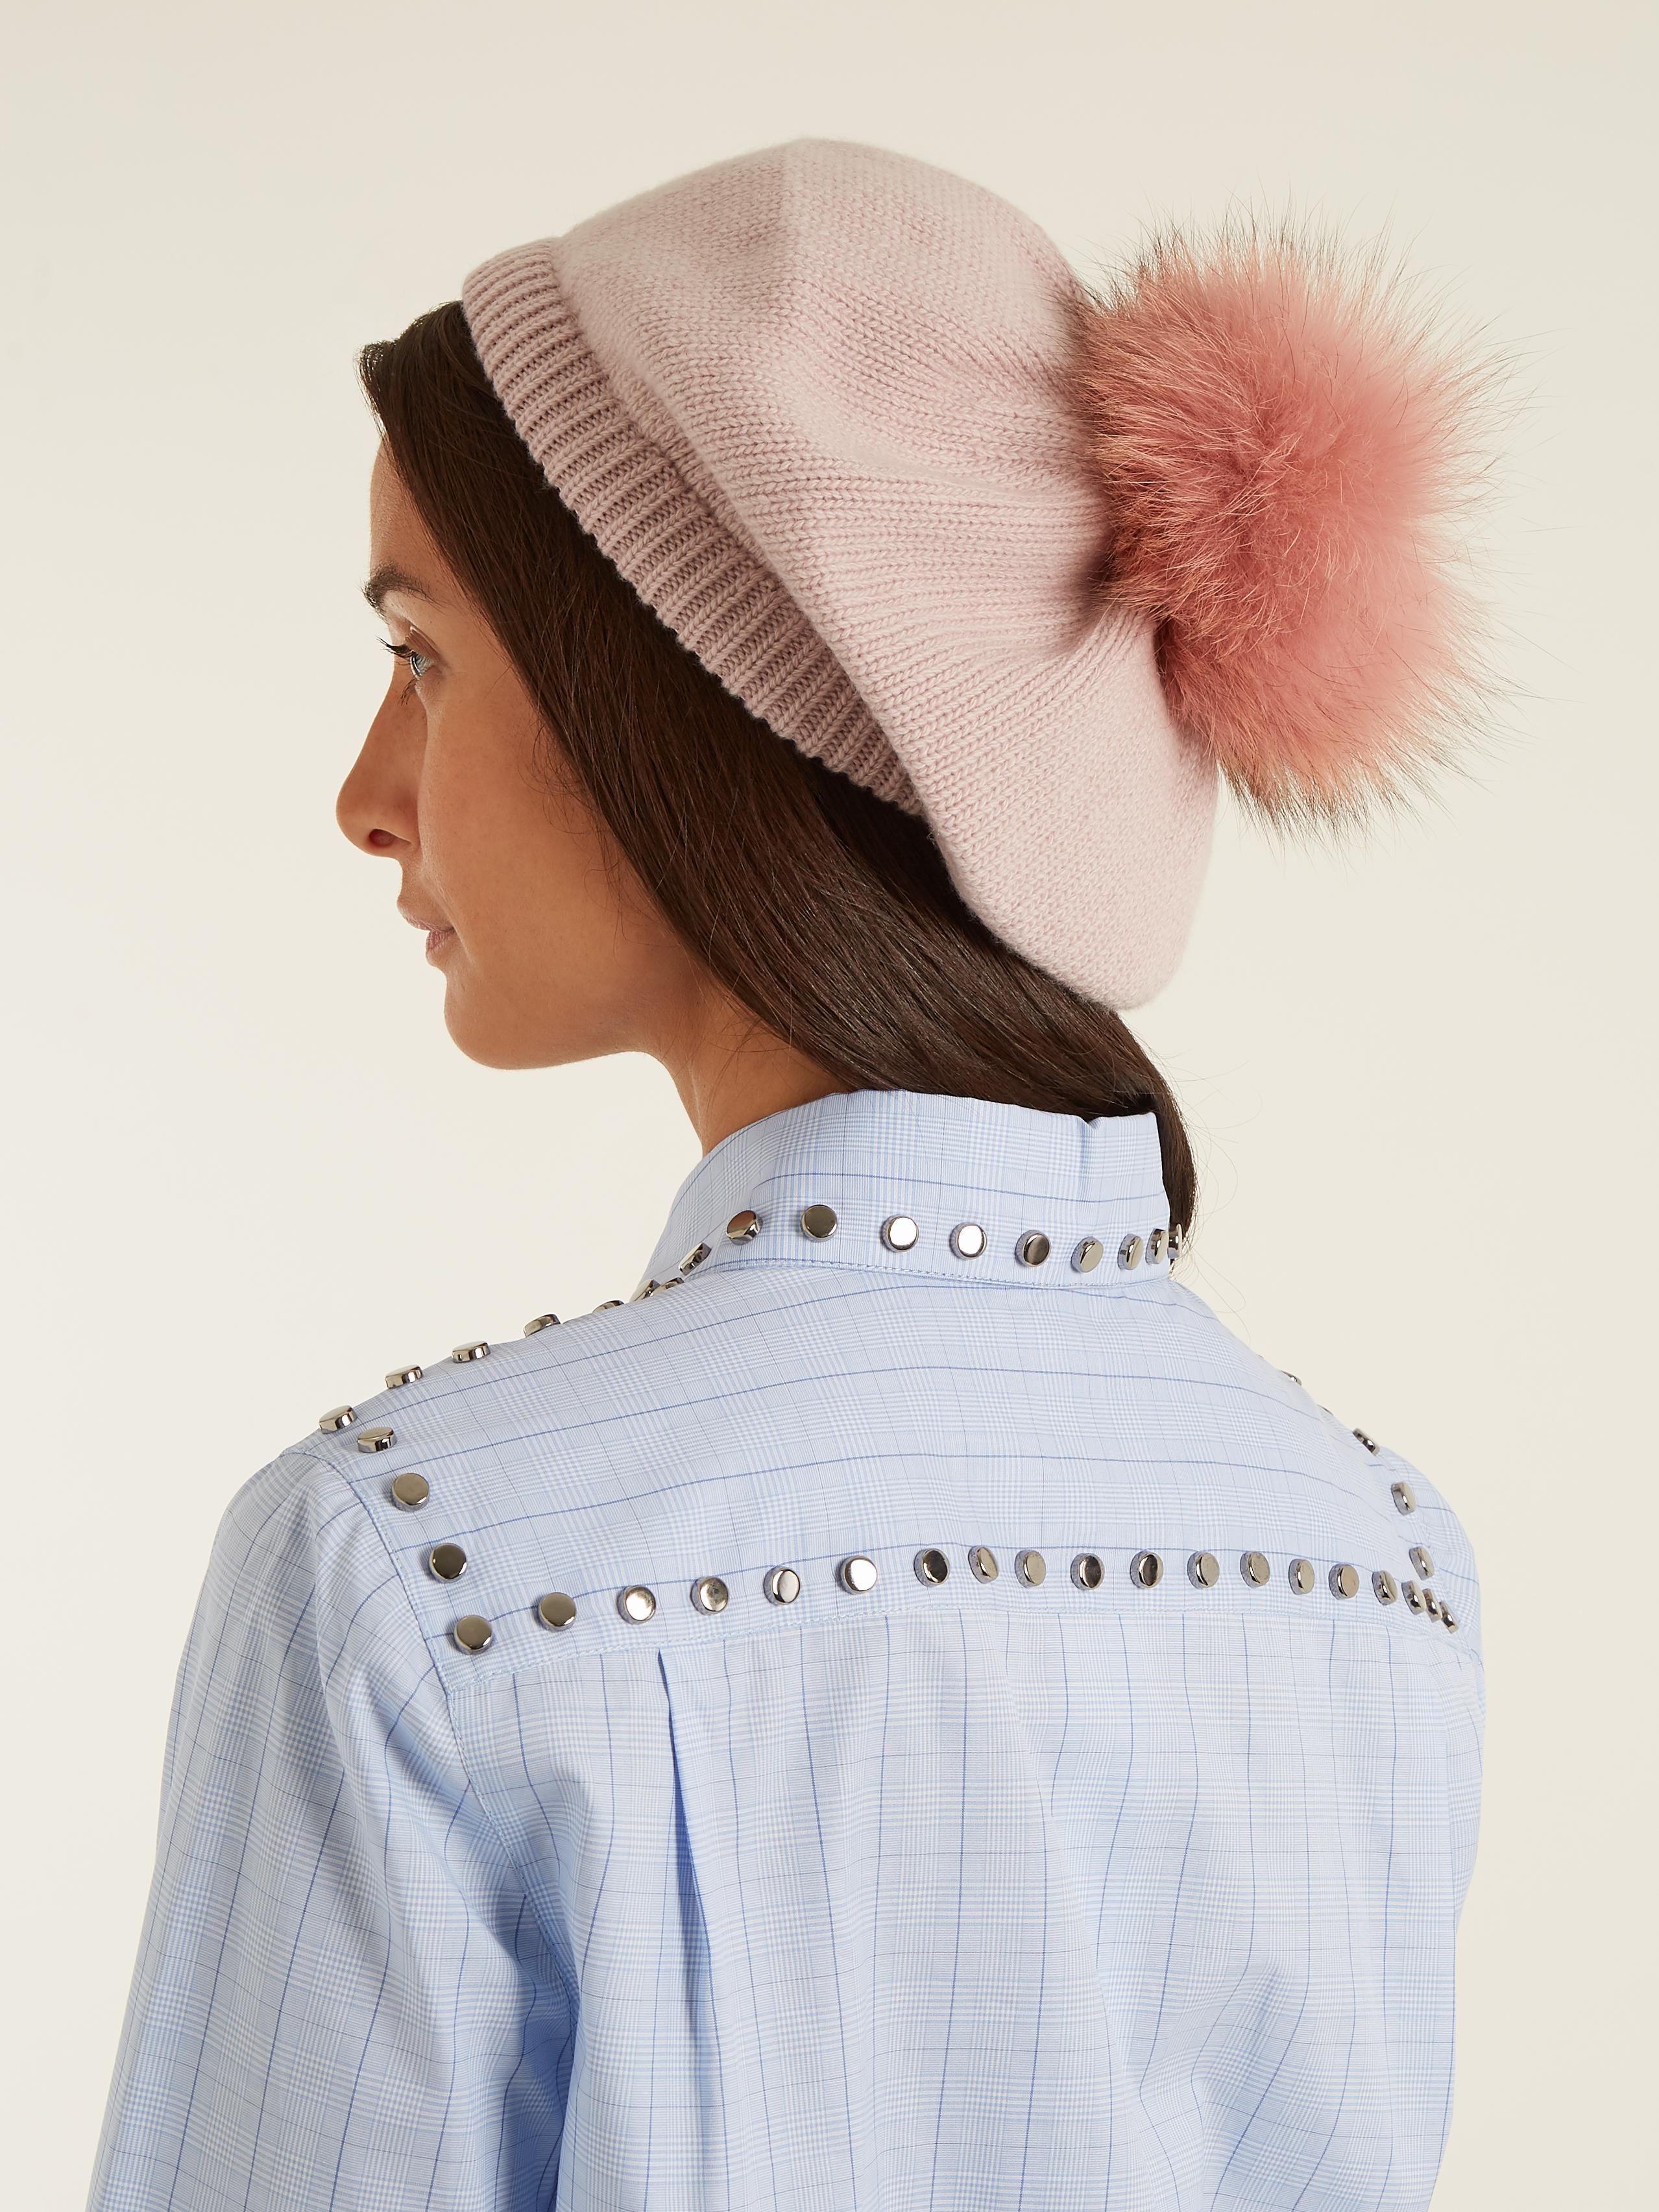 Lyst - Miu Miu Fur-pompom Wool And Cashmere-blend Beret in Pink 14e2aad1efd